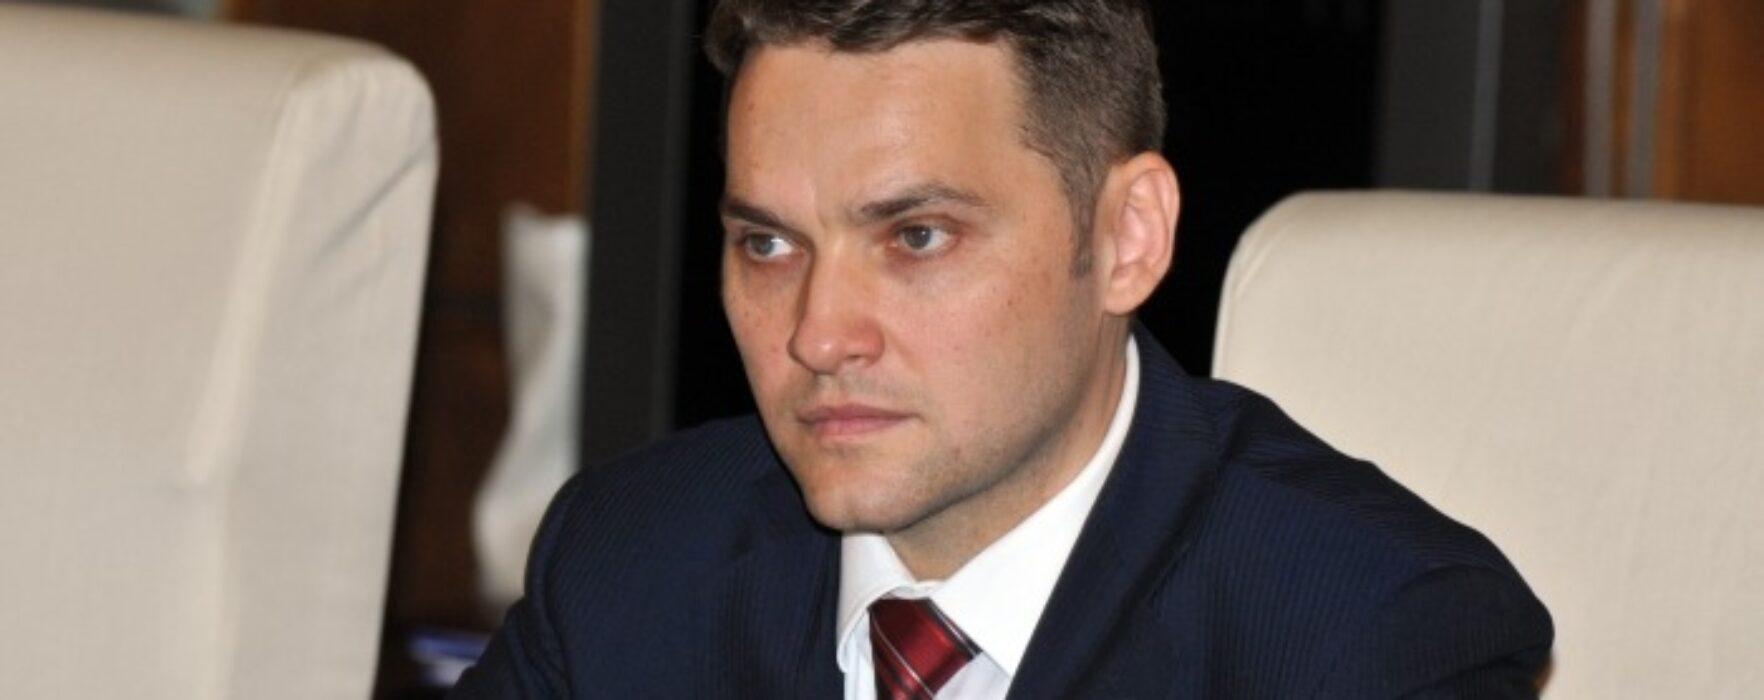 Ministrul Dan Şova va inaugura, joi, podul de la Ioneşti